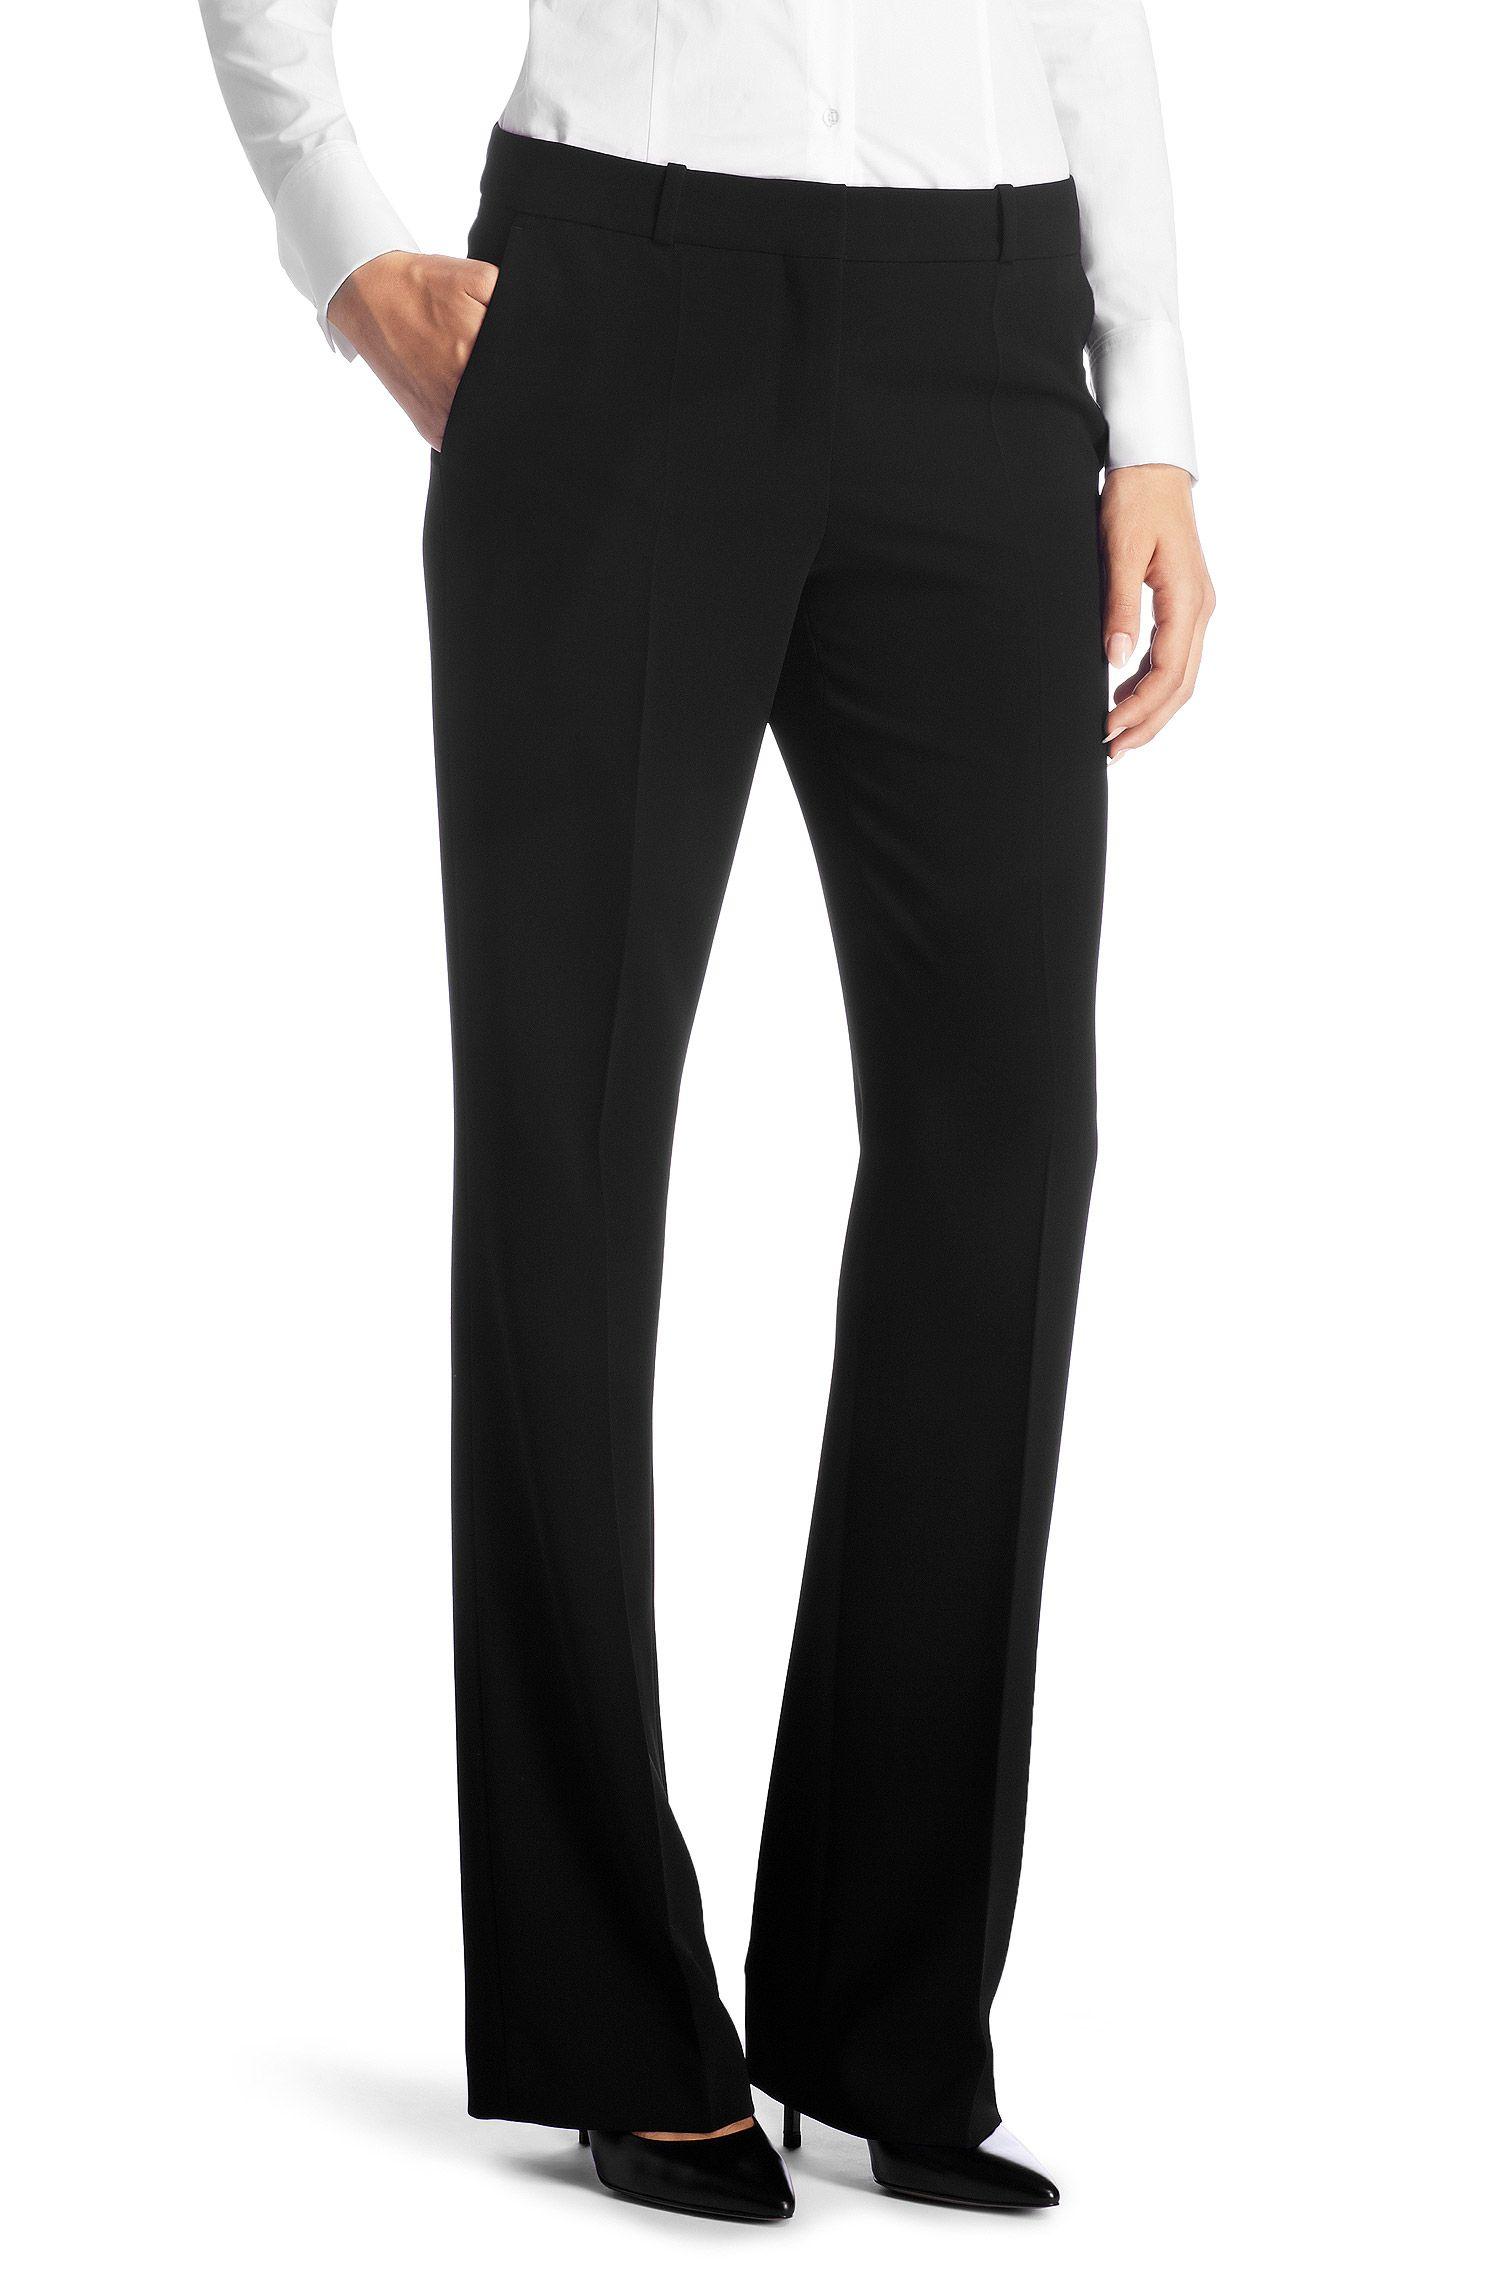 Pantalon Regular Fit à plis de repassage, Tulira